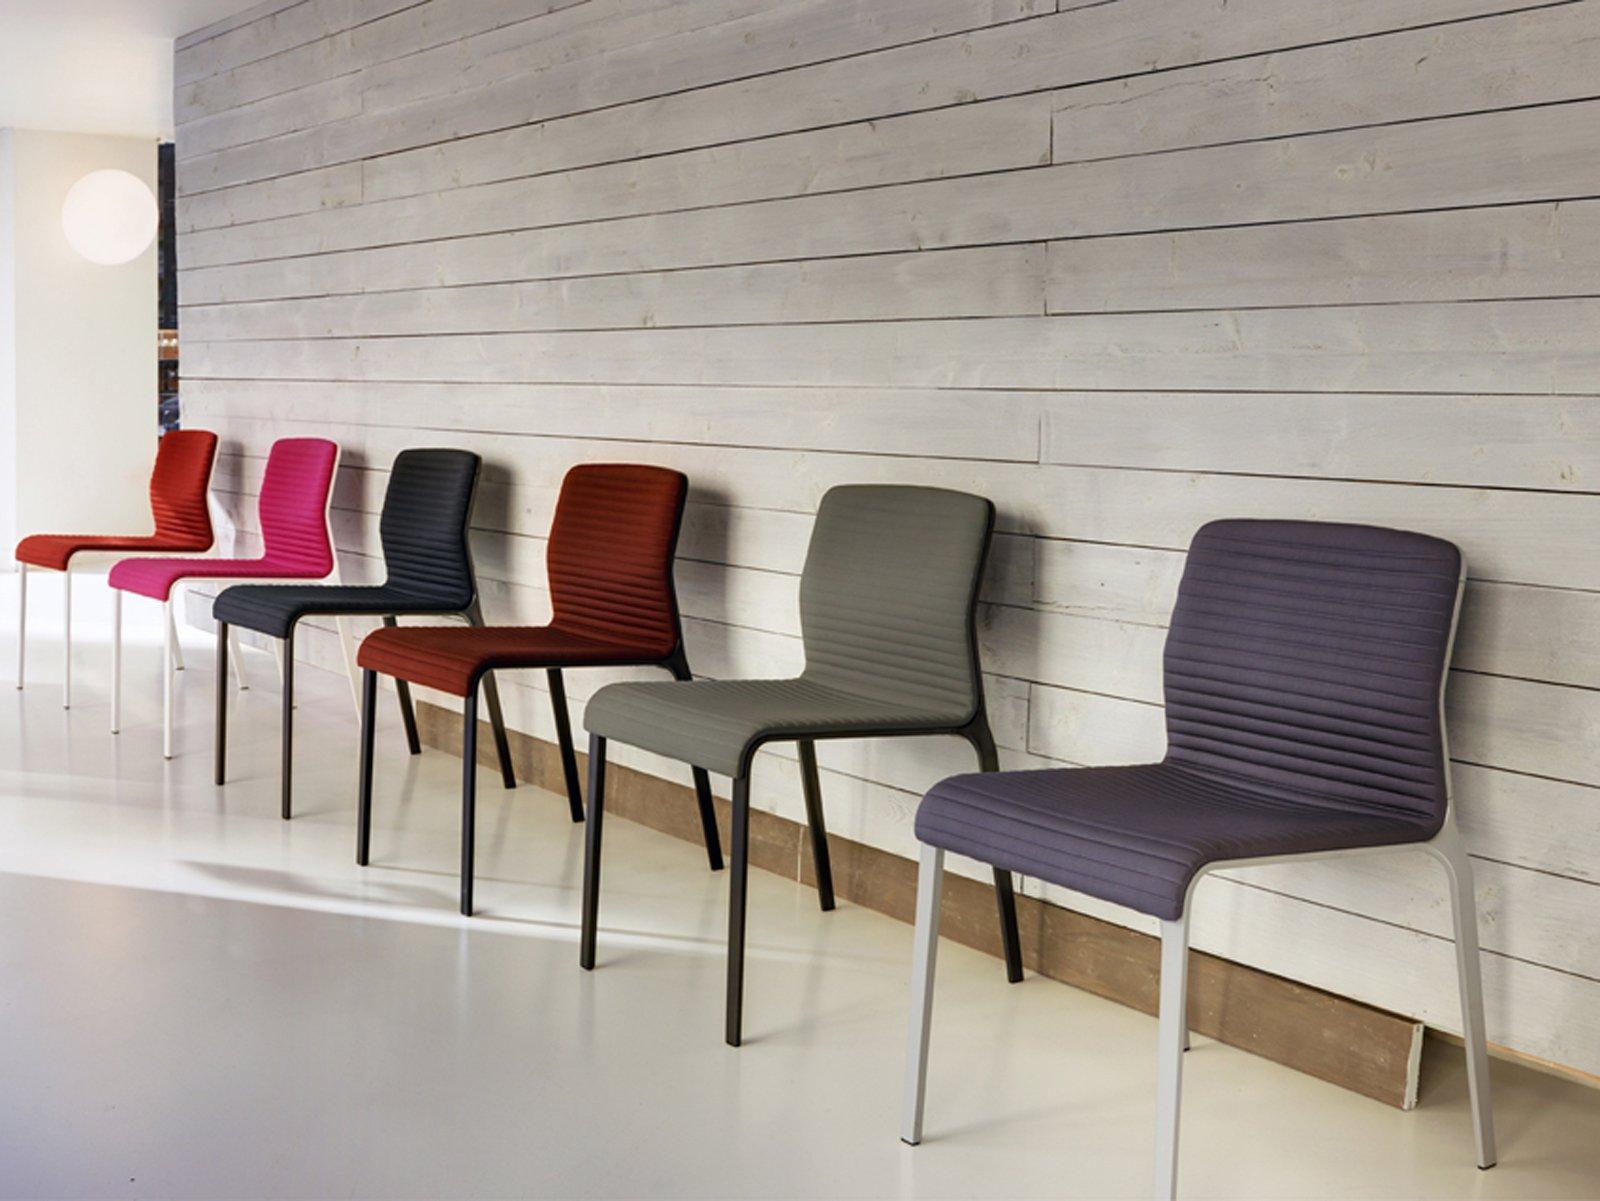 Sedie Design Occasioni ~ bukadar.info = galleria di sedie foto e le ...